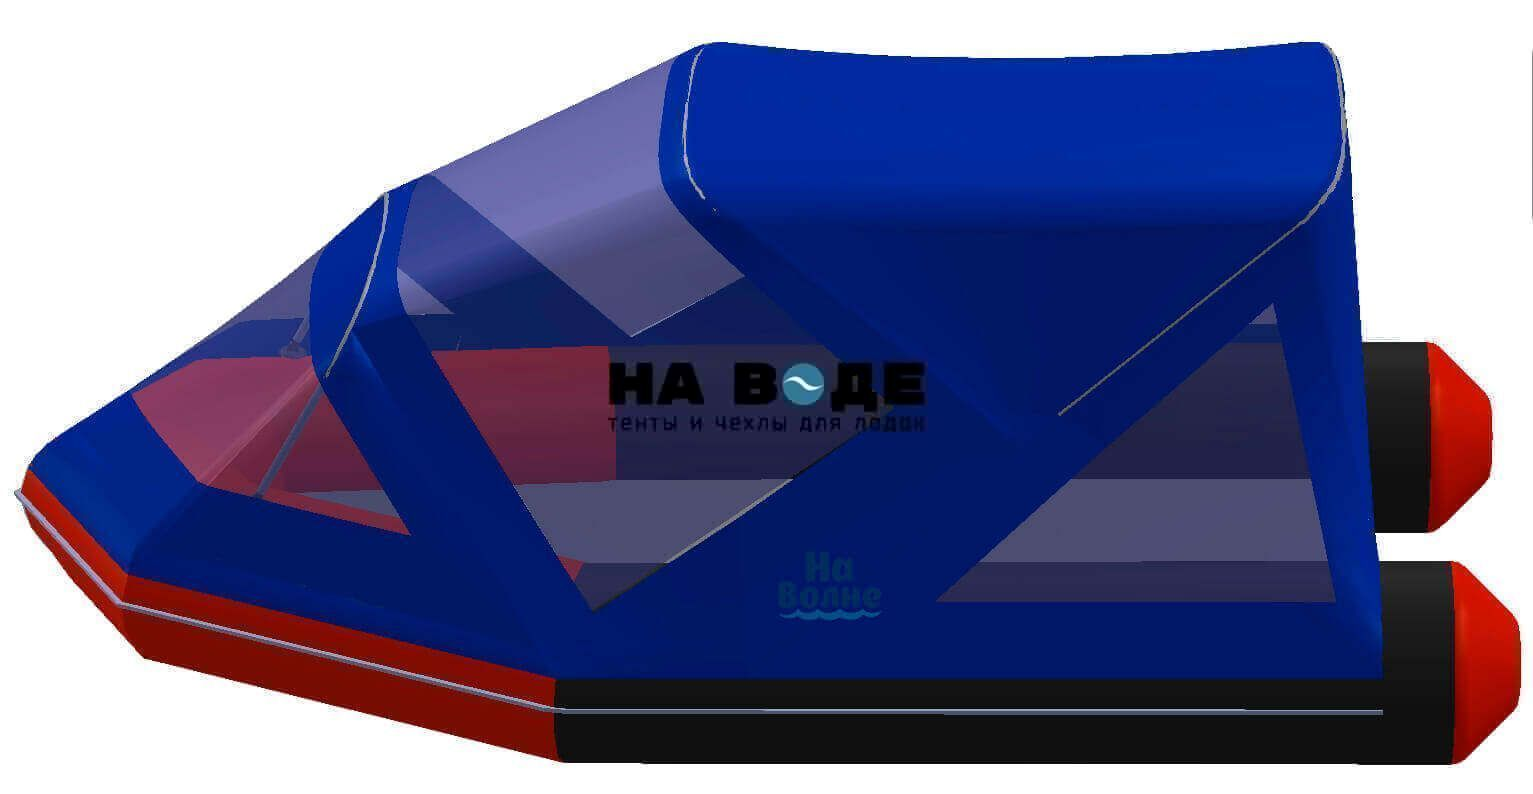 Тент комбинированный на лодку Лоцман М340 (Киль), комплектация Классик - фото 3